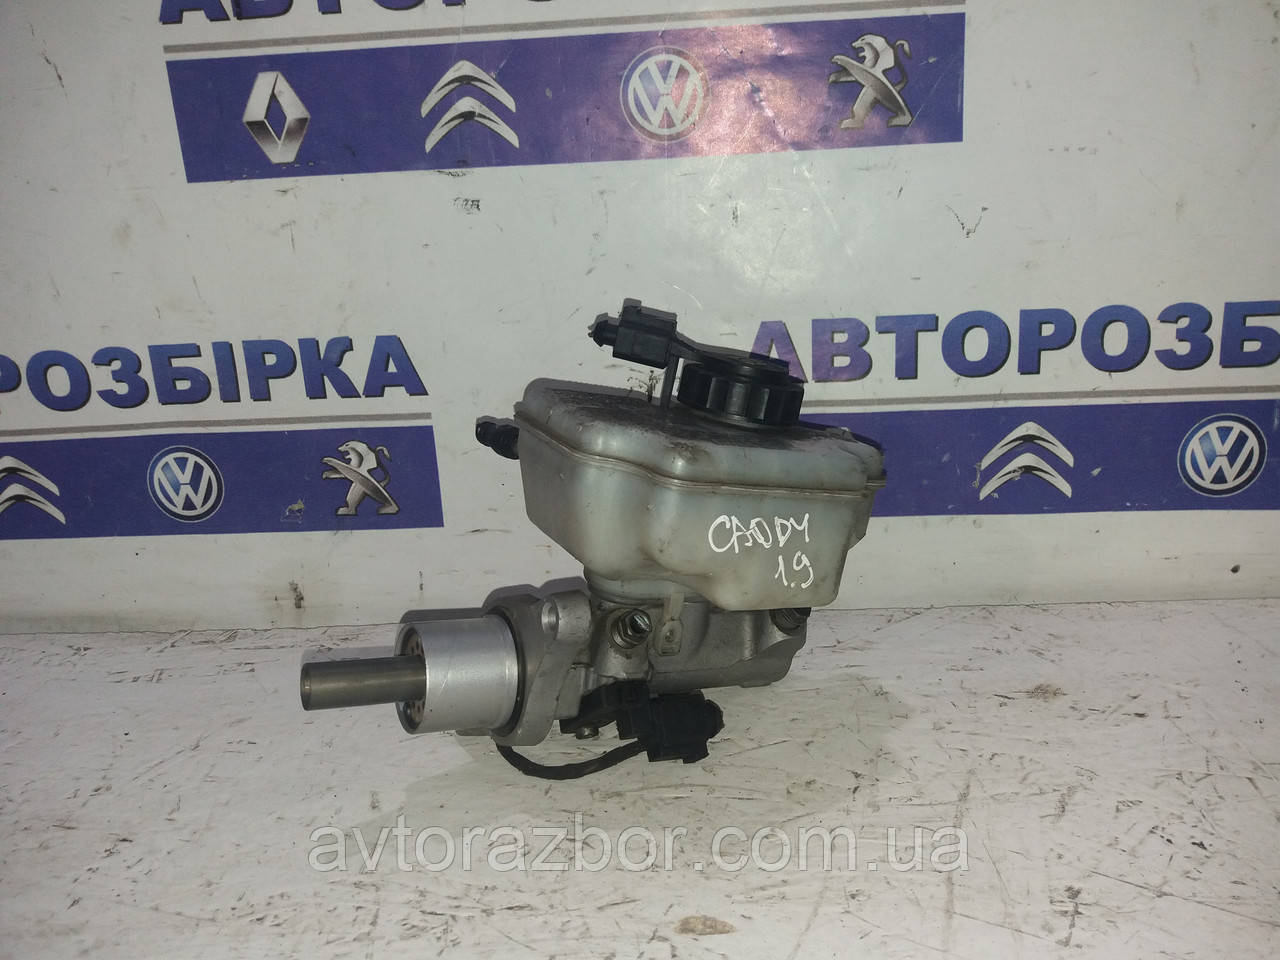 Главный тормозной цилиндр 2/4 выхода Volkswagen Caddy 04-09 Фольксваген Кадди Кадді